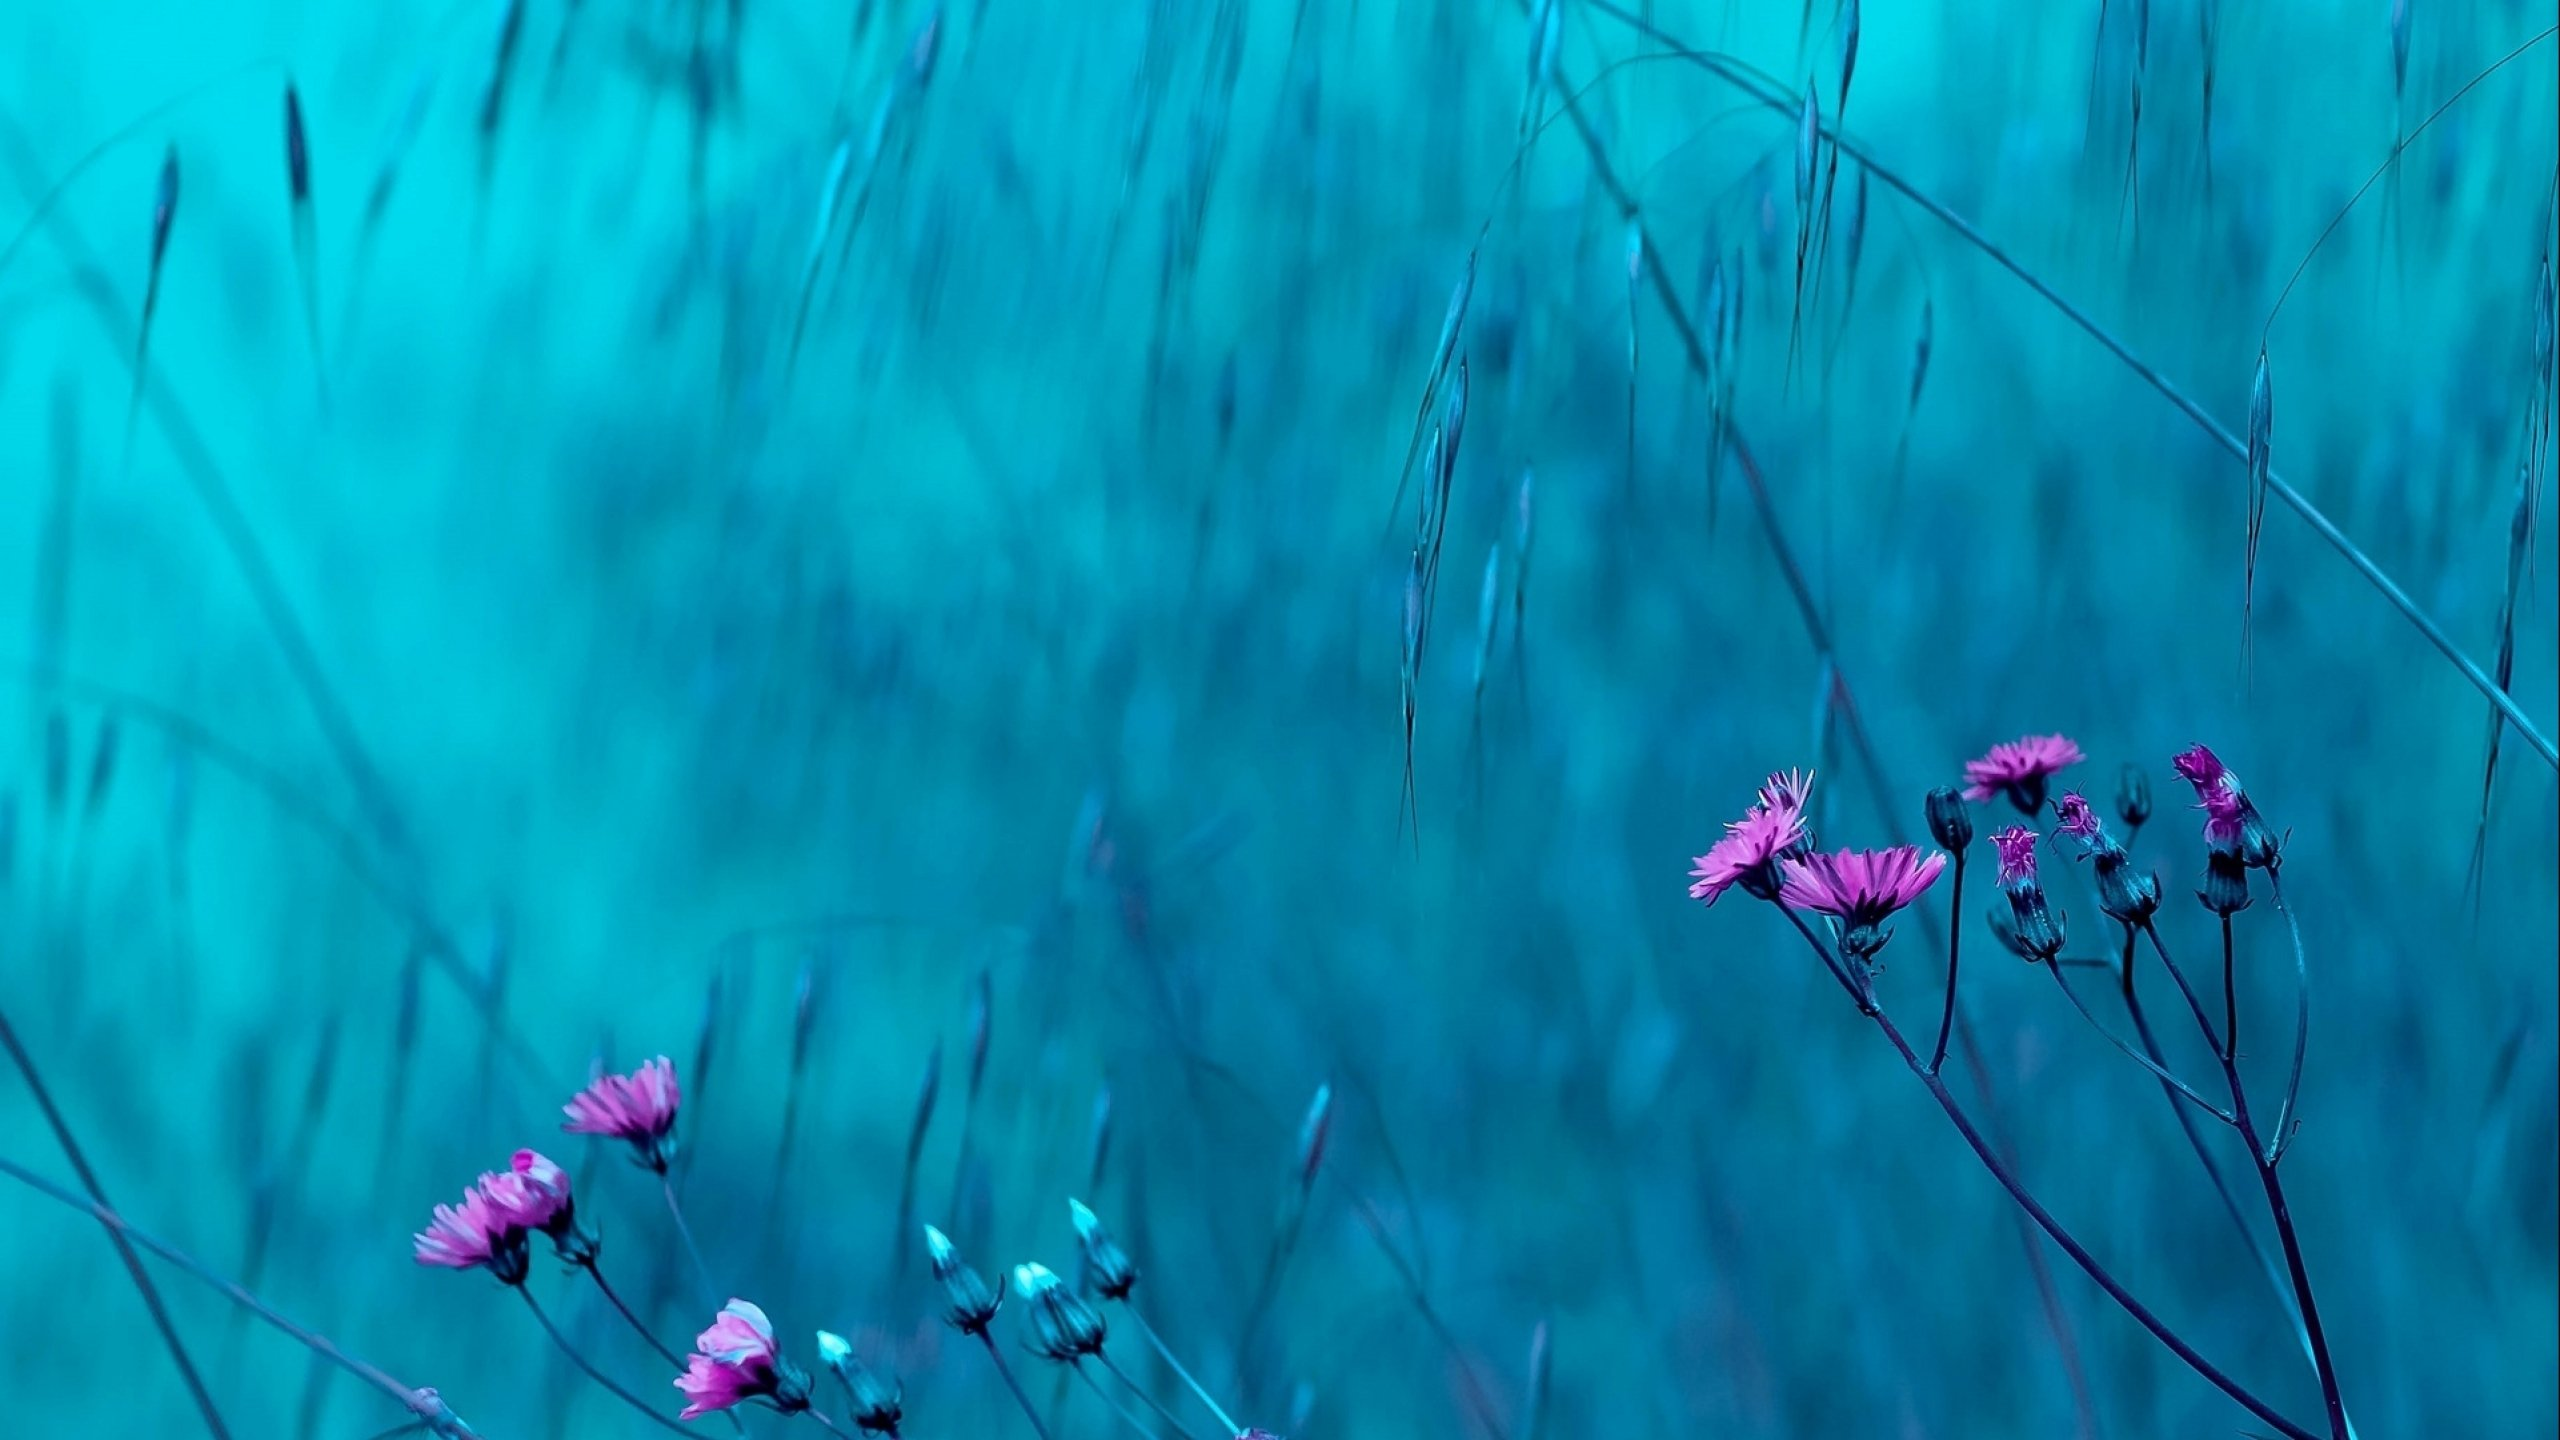 flower_flowerrs_nature_landscape_2560x1440.jpg